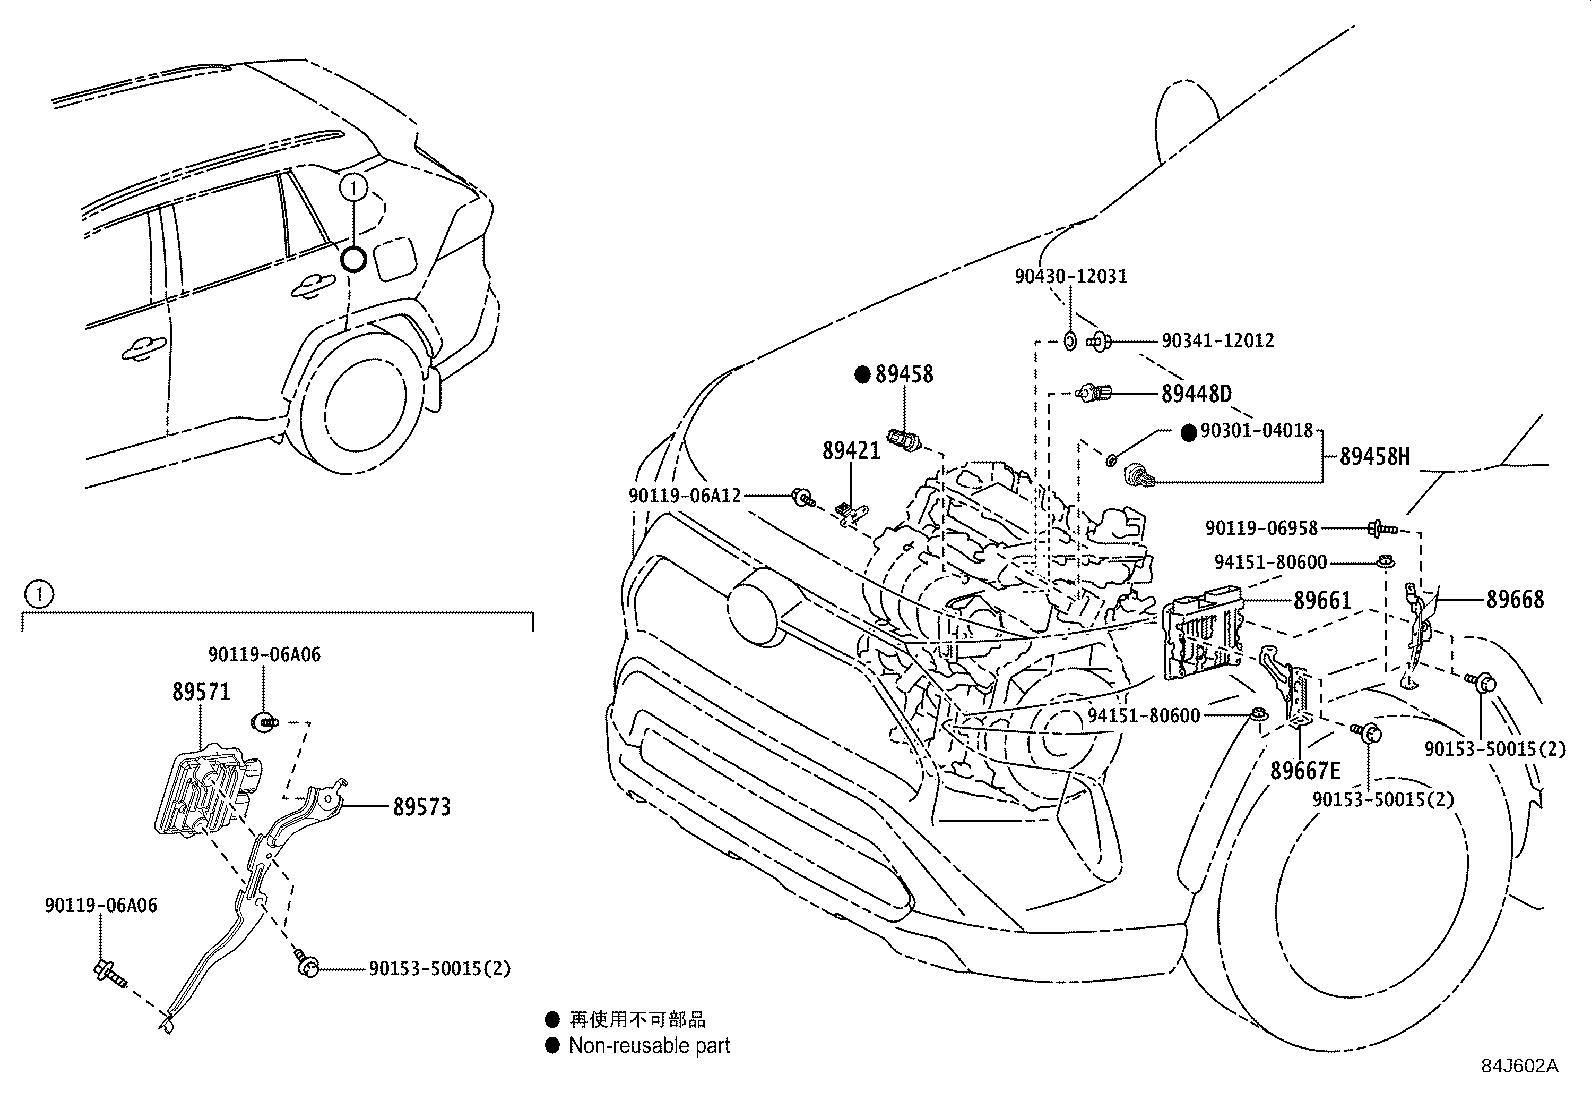 Toyota RAV4 Computer, engine control. Electrical, denso